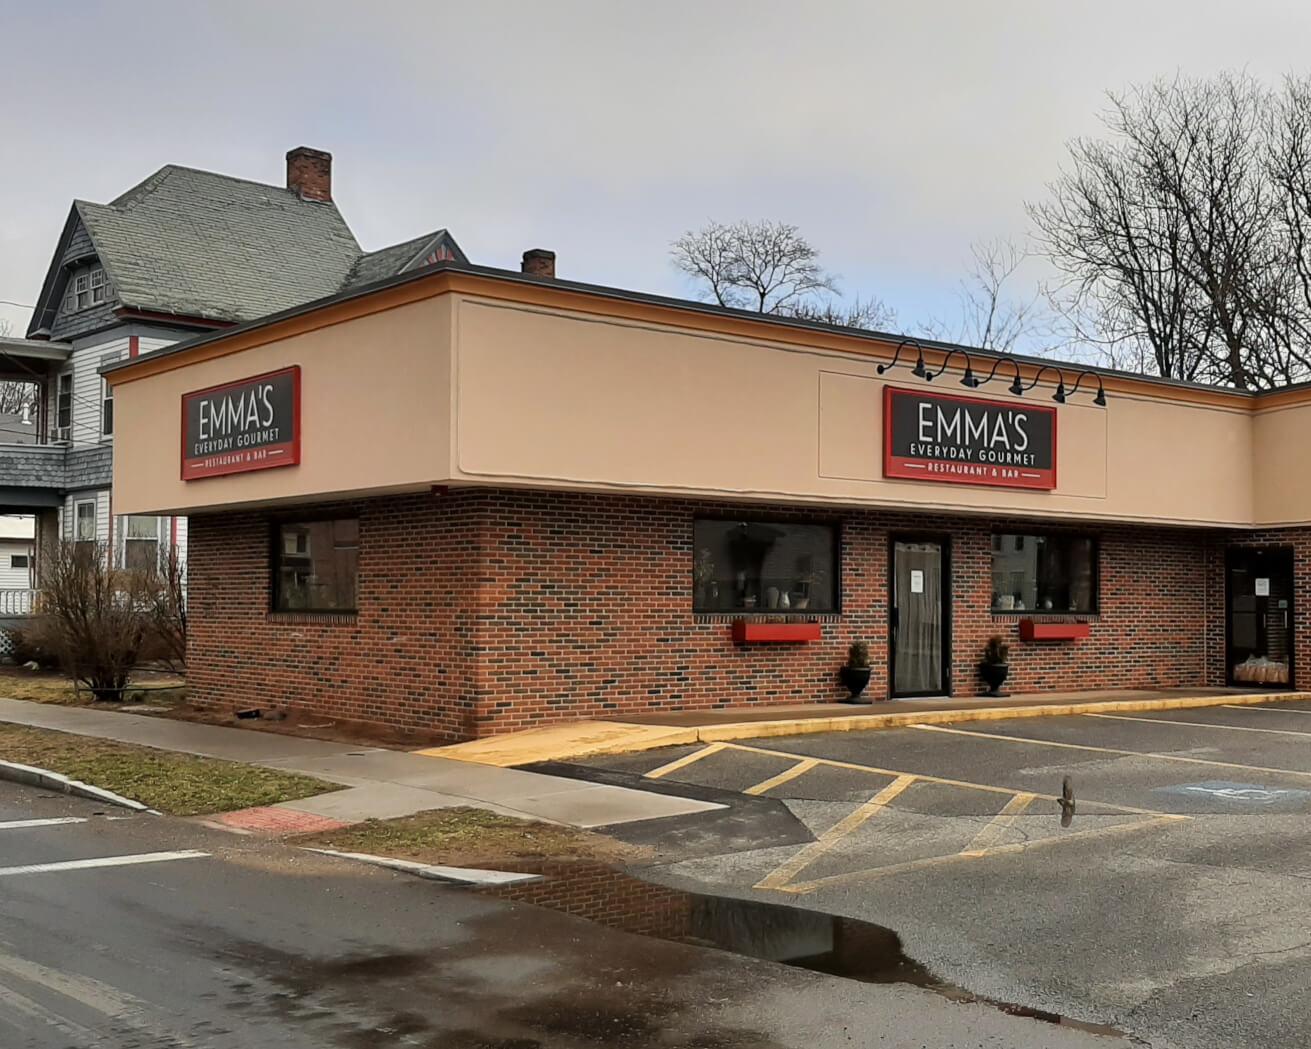 Emma's Everyday Gourmet Westfield, MA